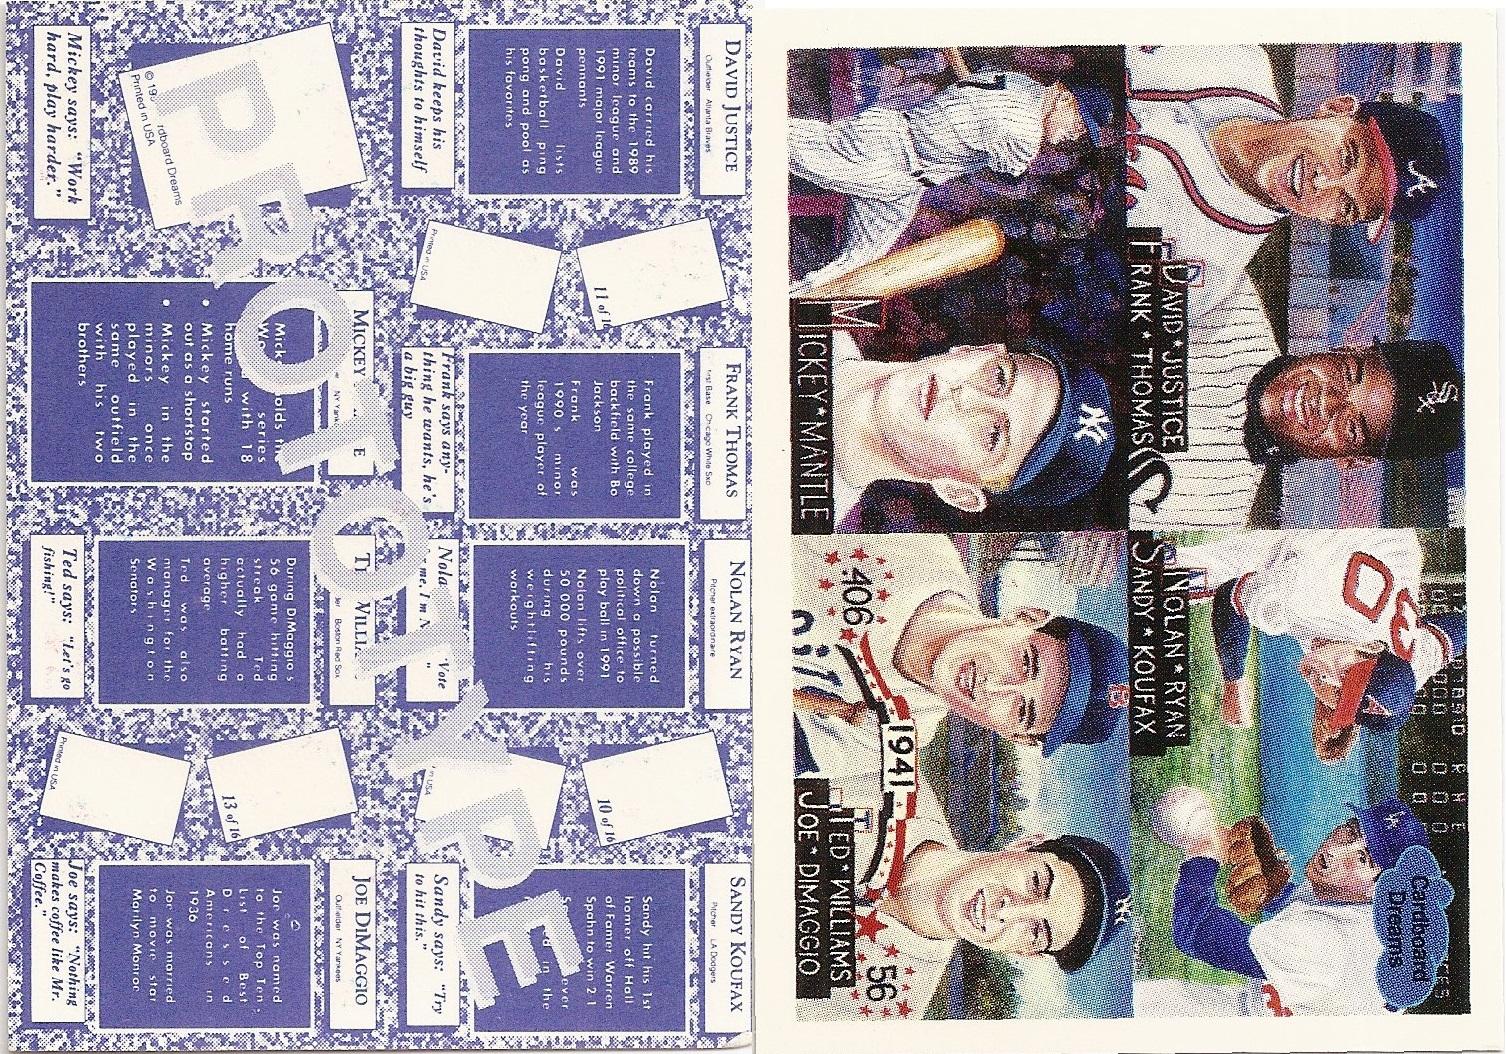 SCAN8463 - Copy (8)